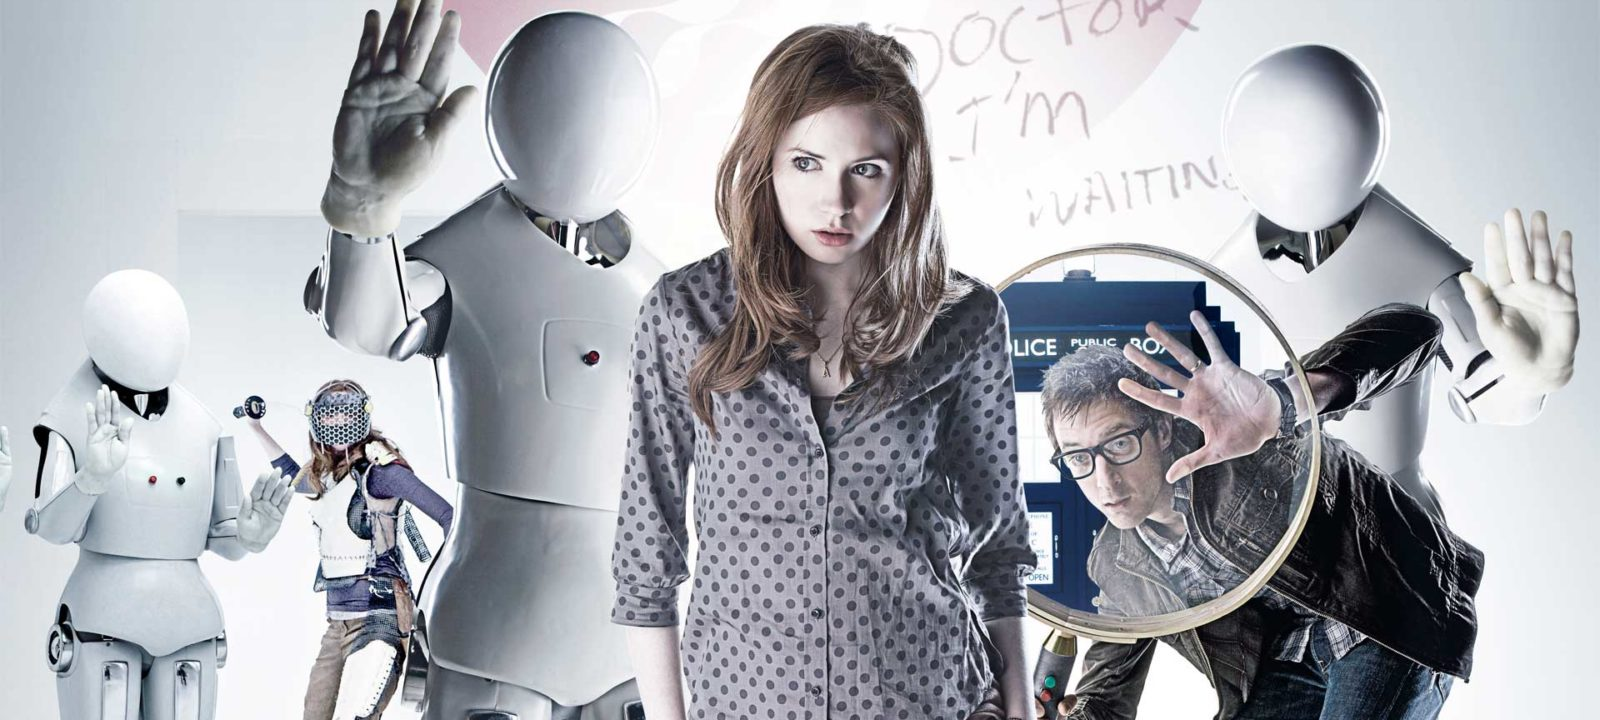 'The Girl Who Waited' (Photo: BBC)